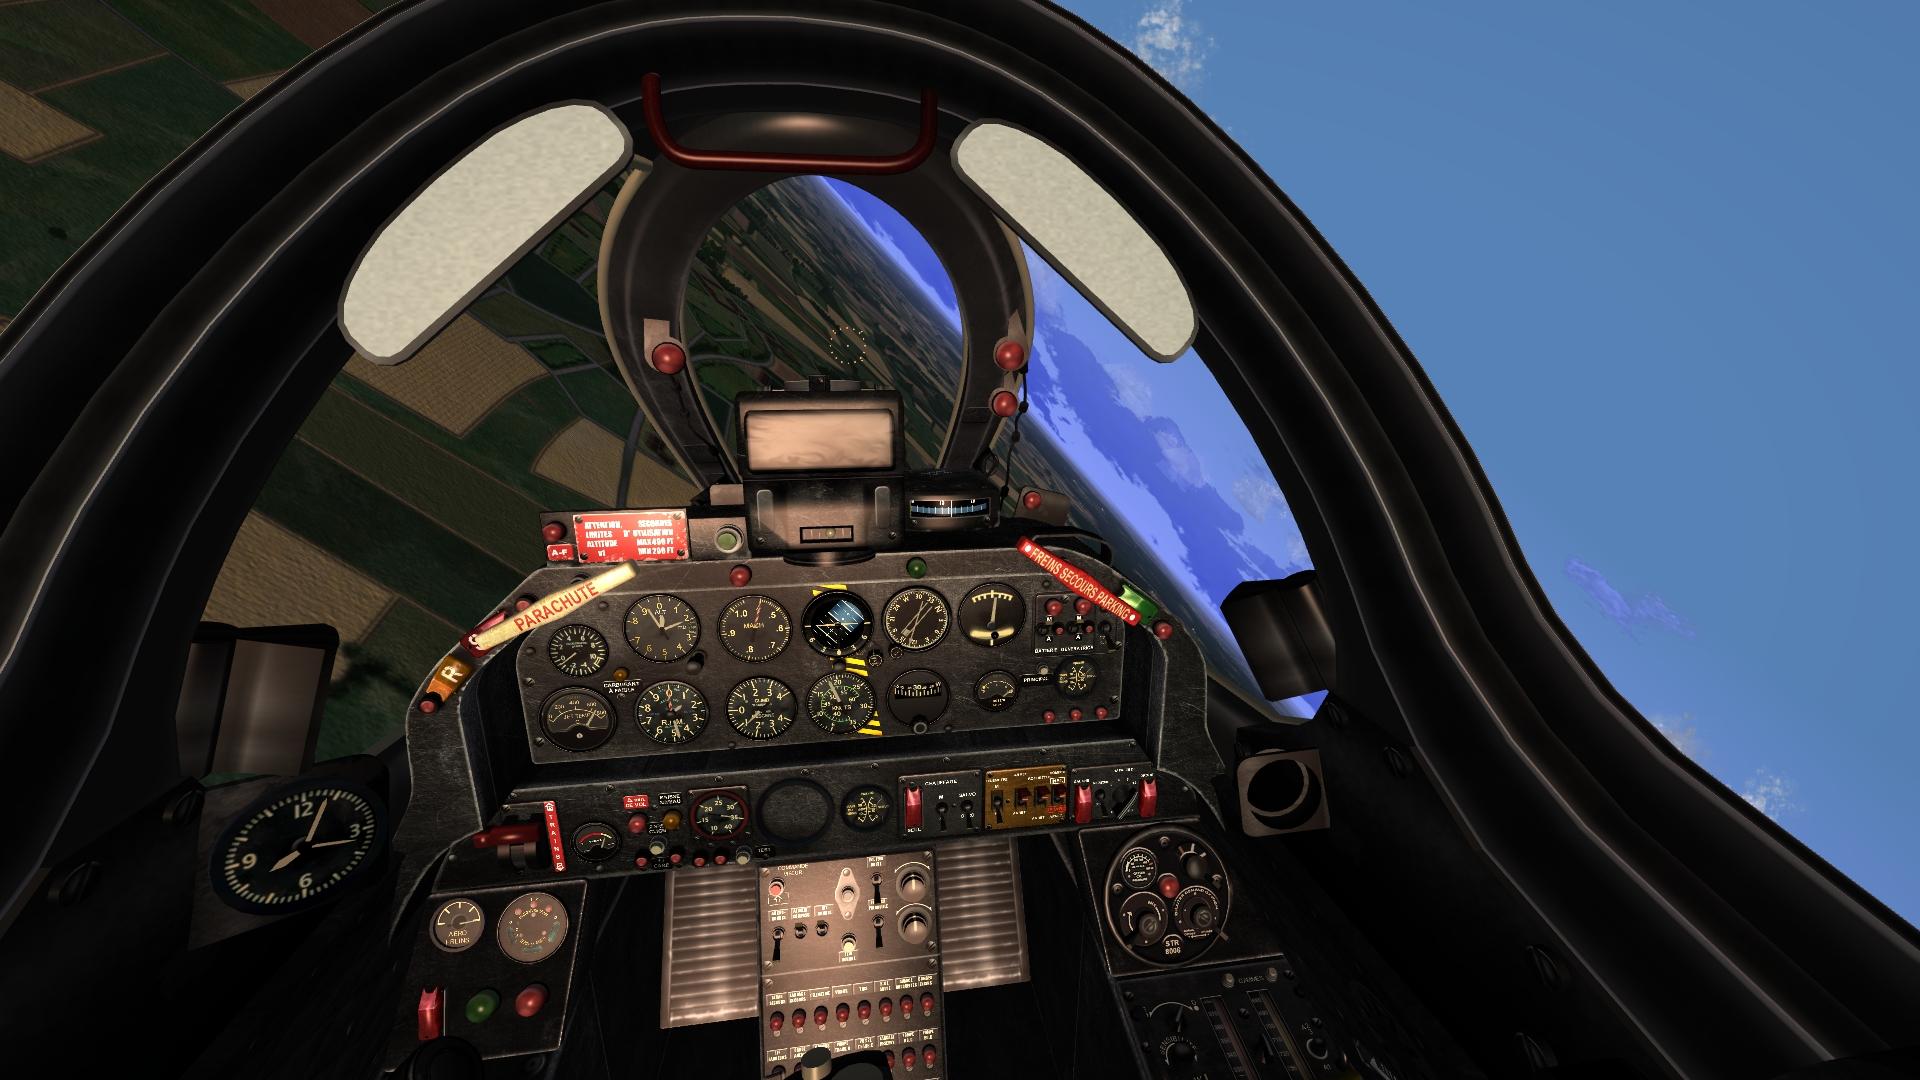 Super Mystere B2 cockpit